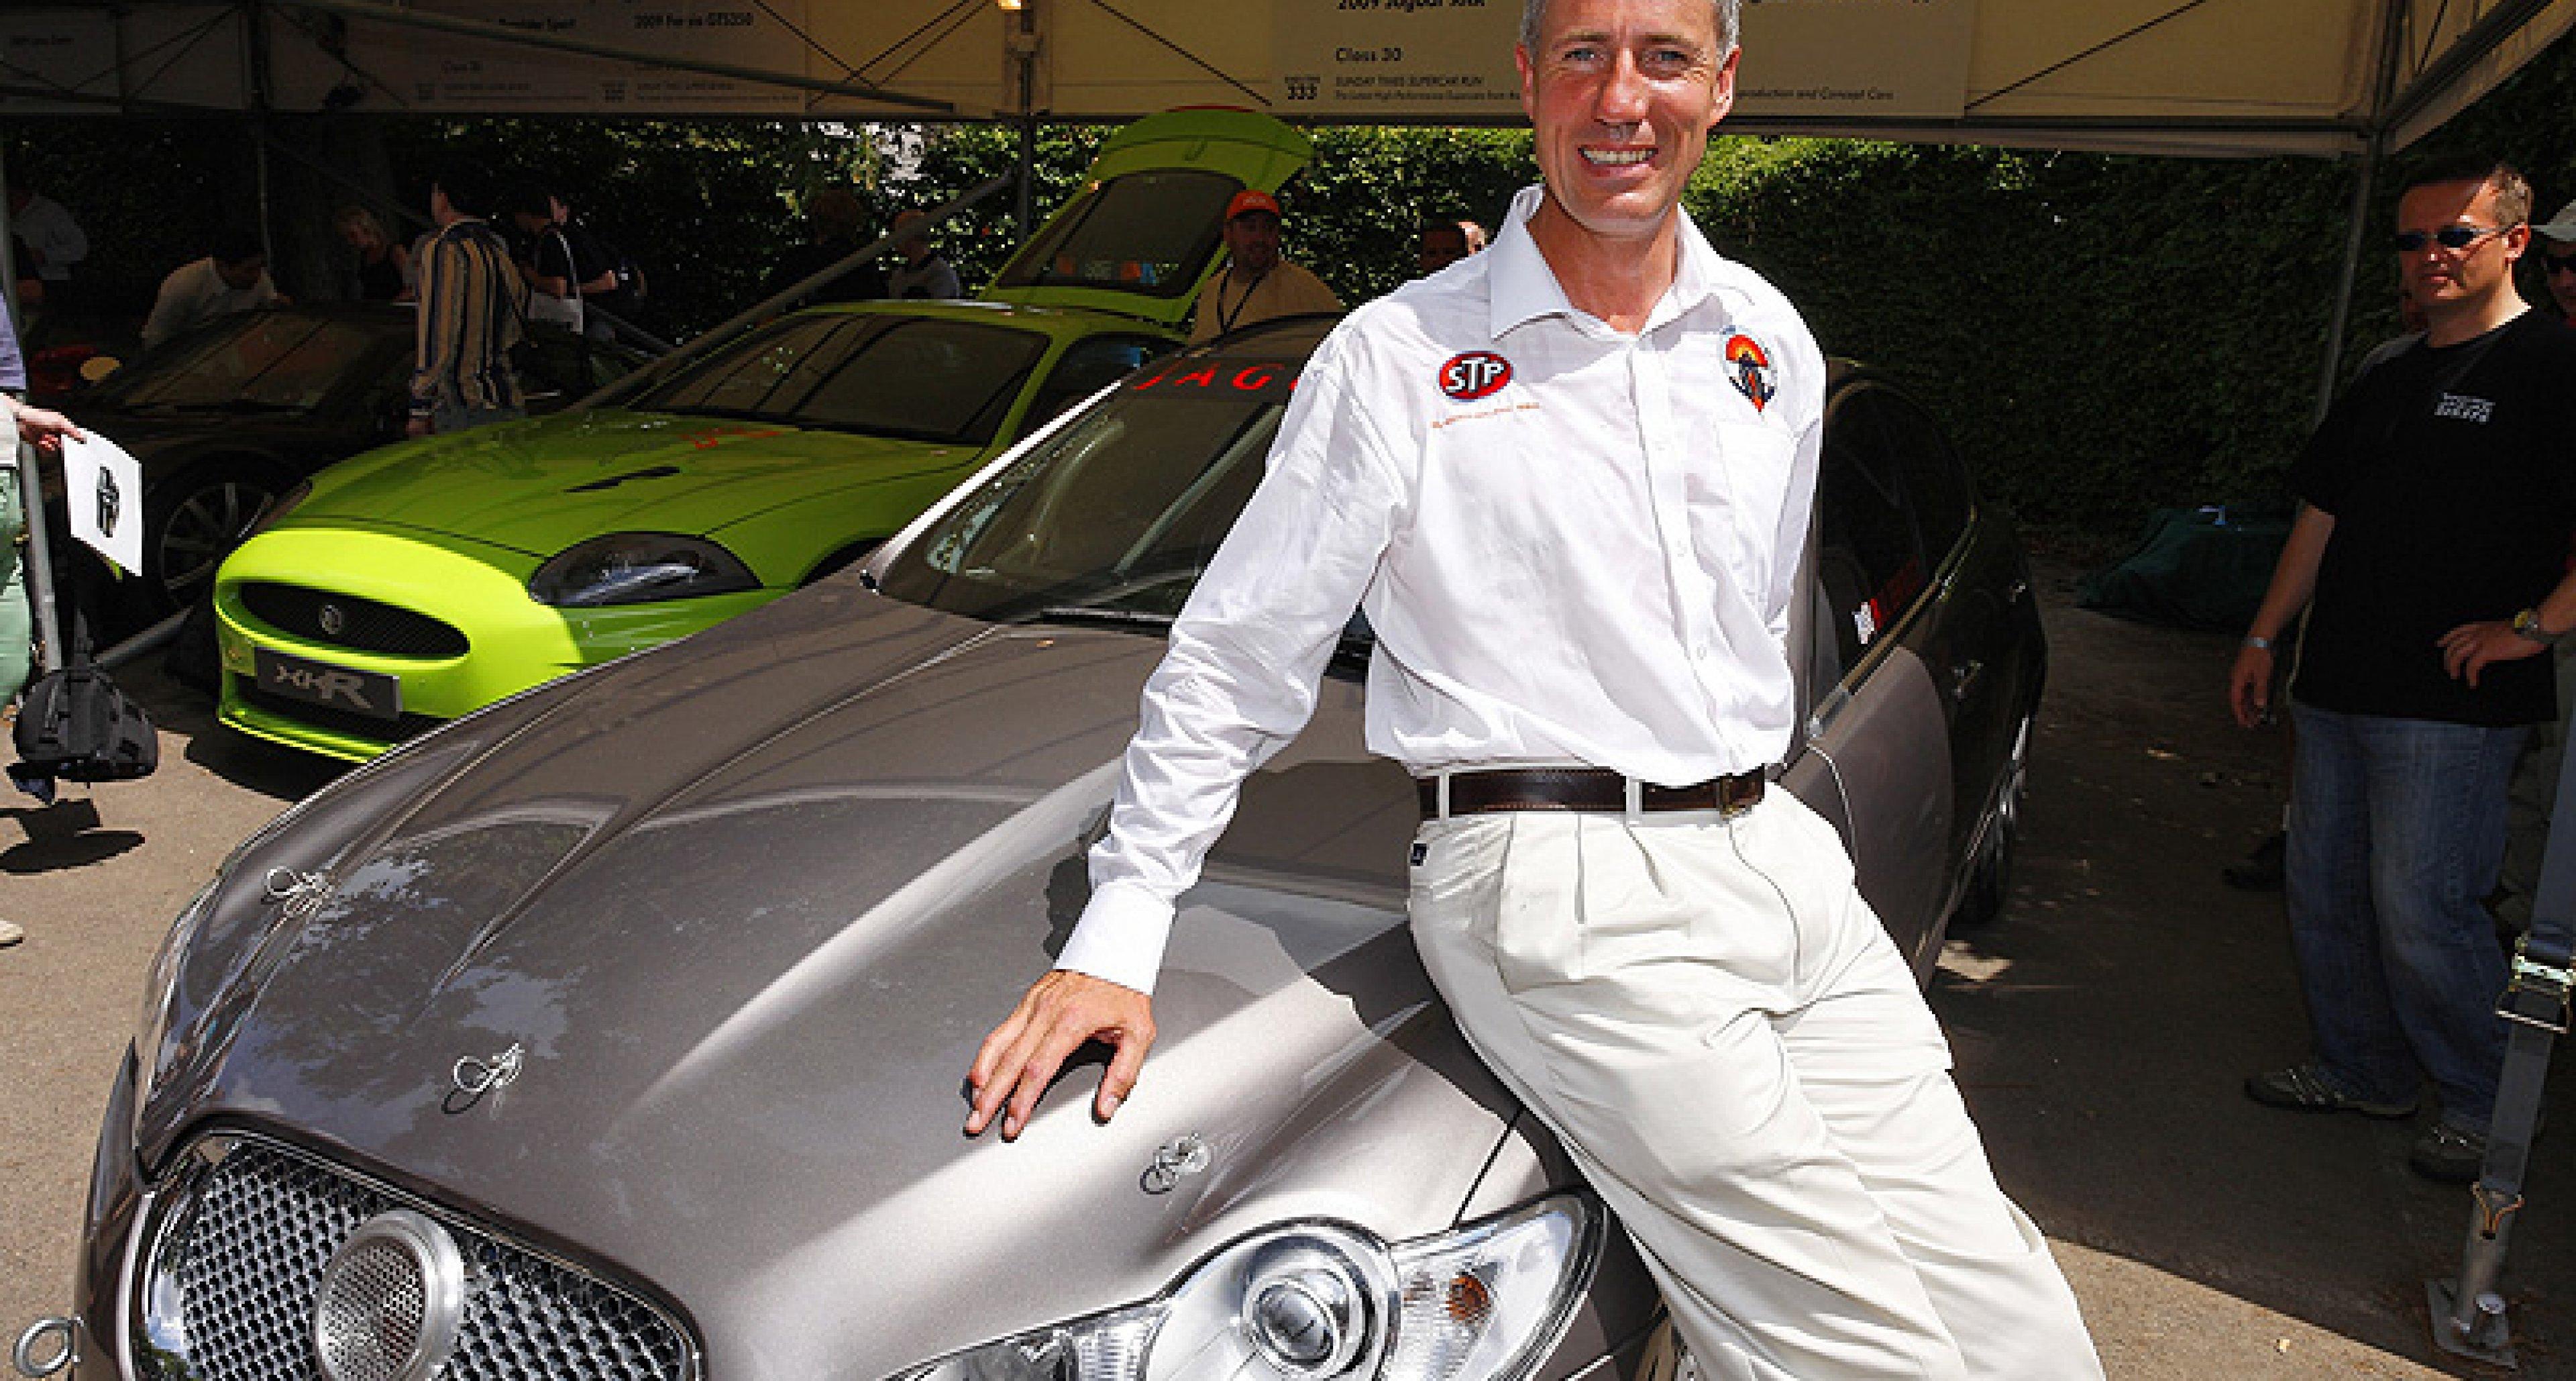 Jaguar in Goodwood: Just Vrooom!